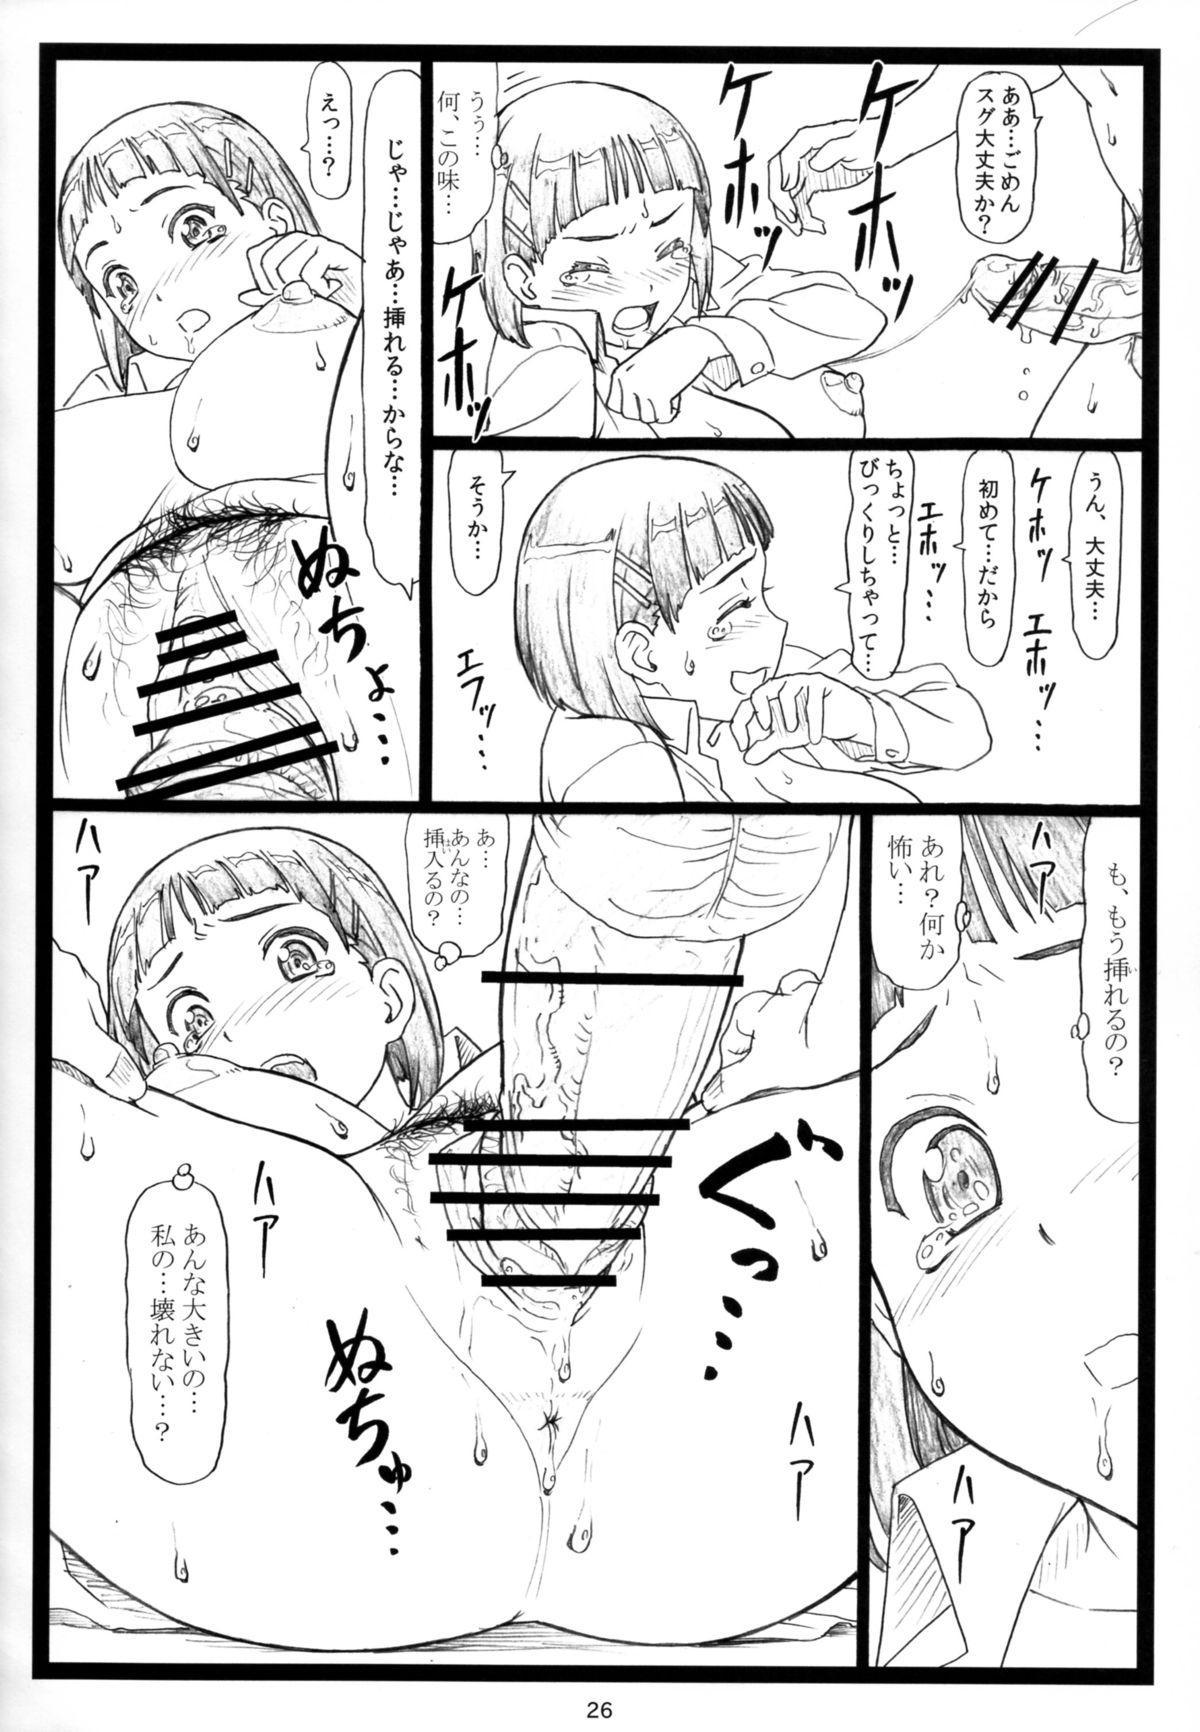 Kuzuha 25